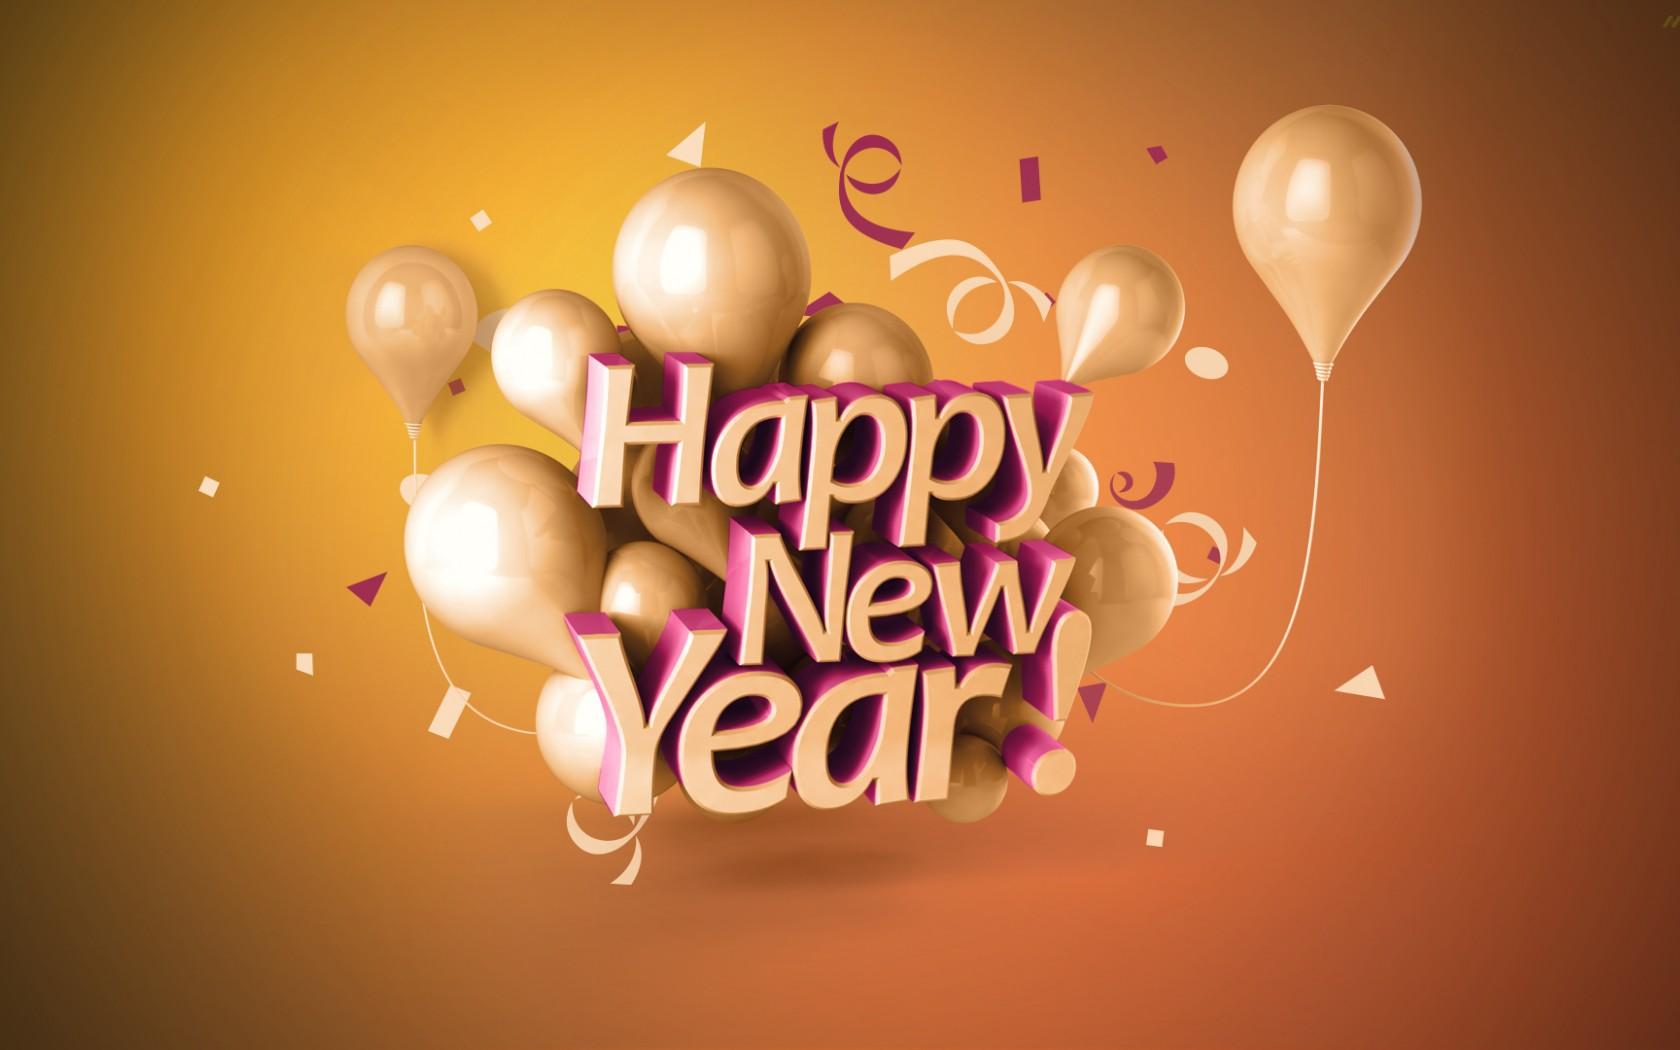 D Happy New Year wallpaper 1680x1050